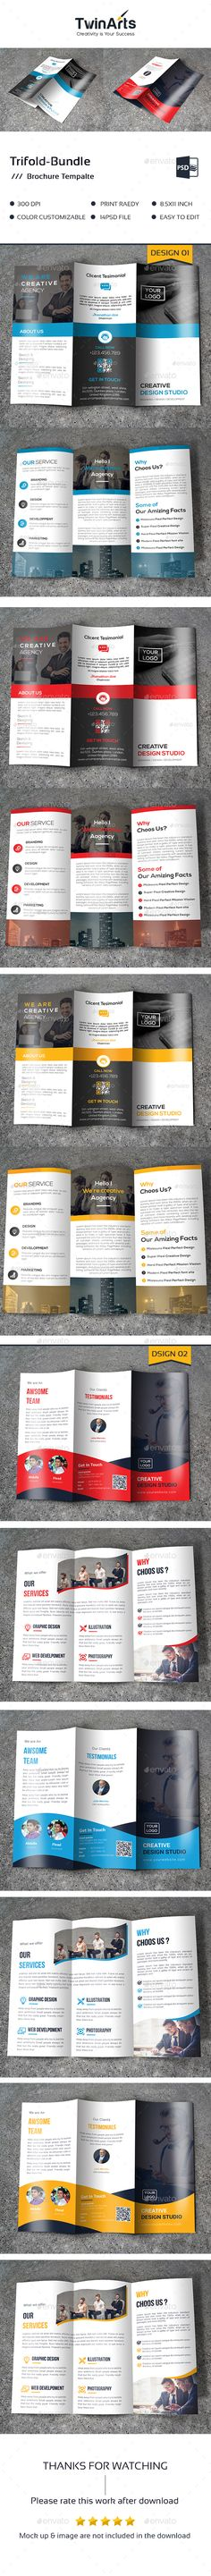 2 Tri-fold Brochure Templates PSD. Download here: https://graphicriver.net/item/trifold-bundle_2-in-1/17122500?ref=ksioks